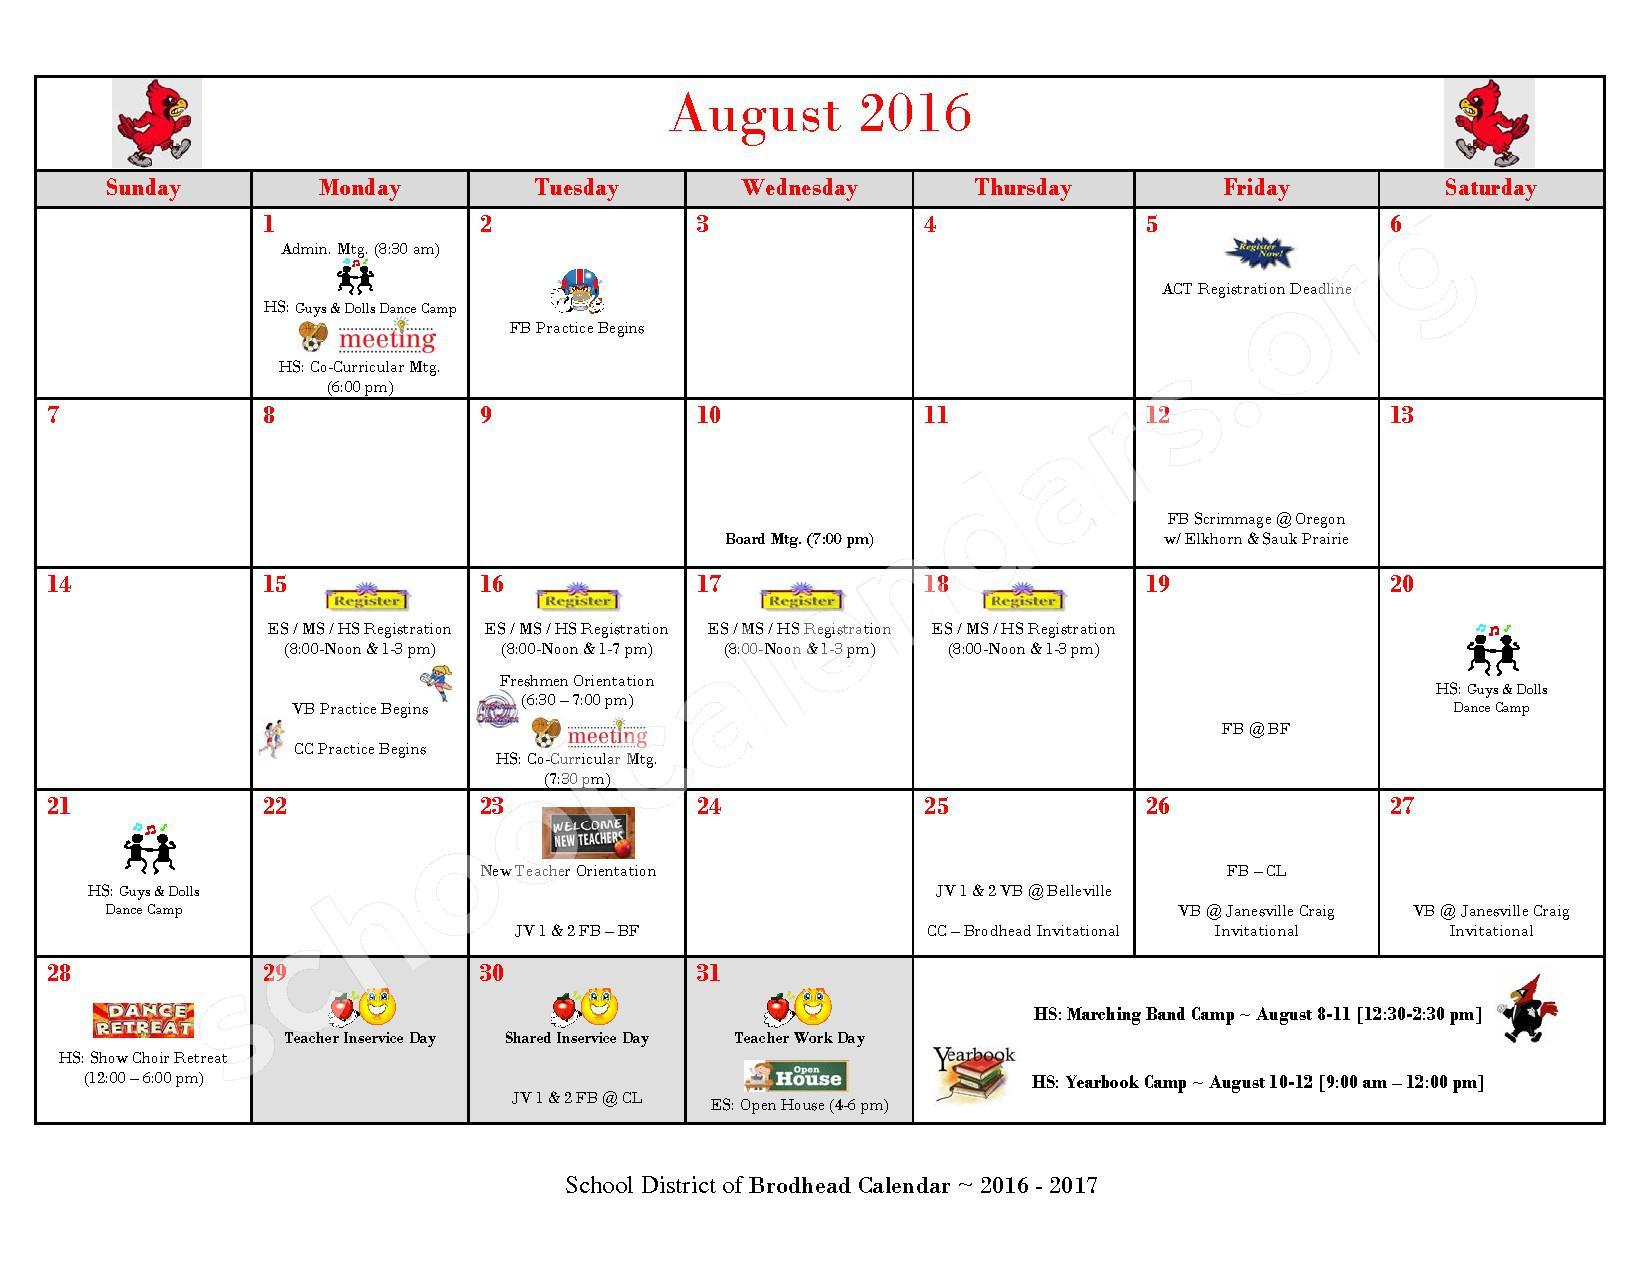 2016 - 2017 School Calendar – Brodhead School District – page 1